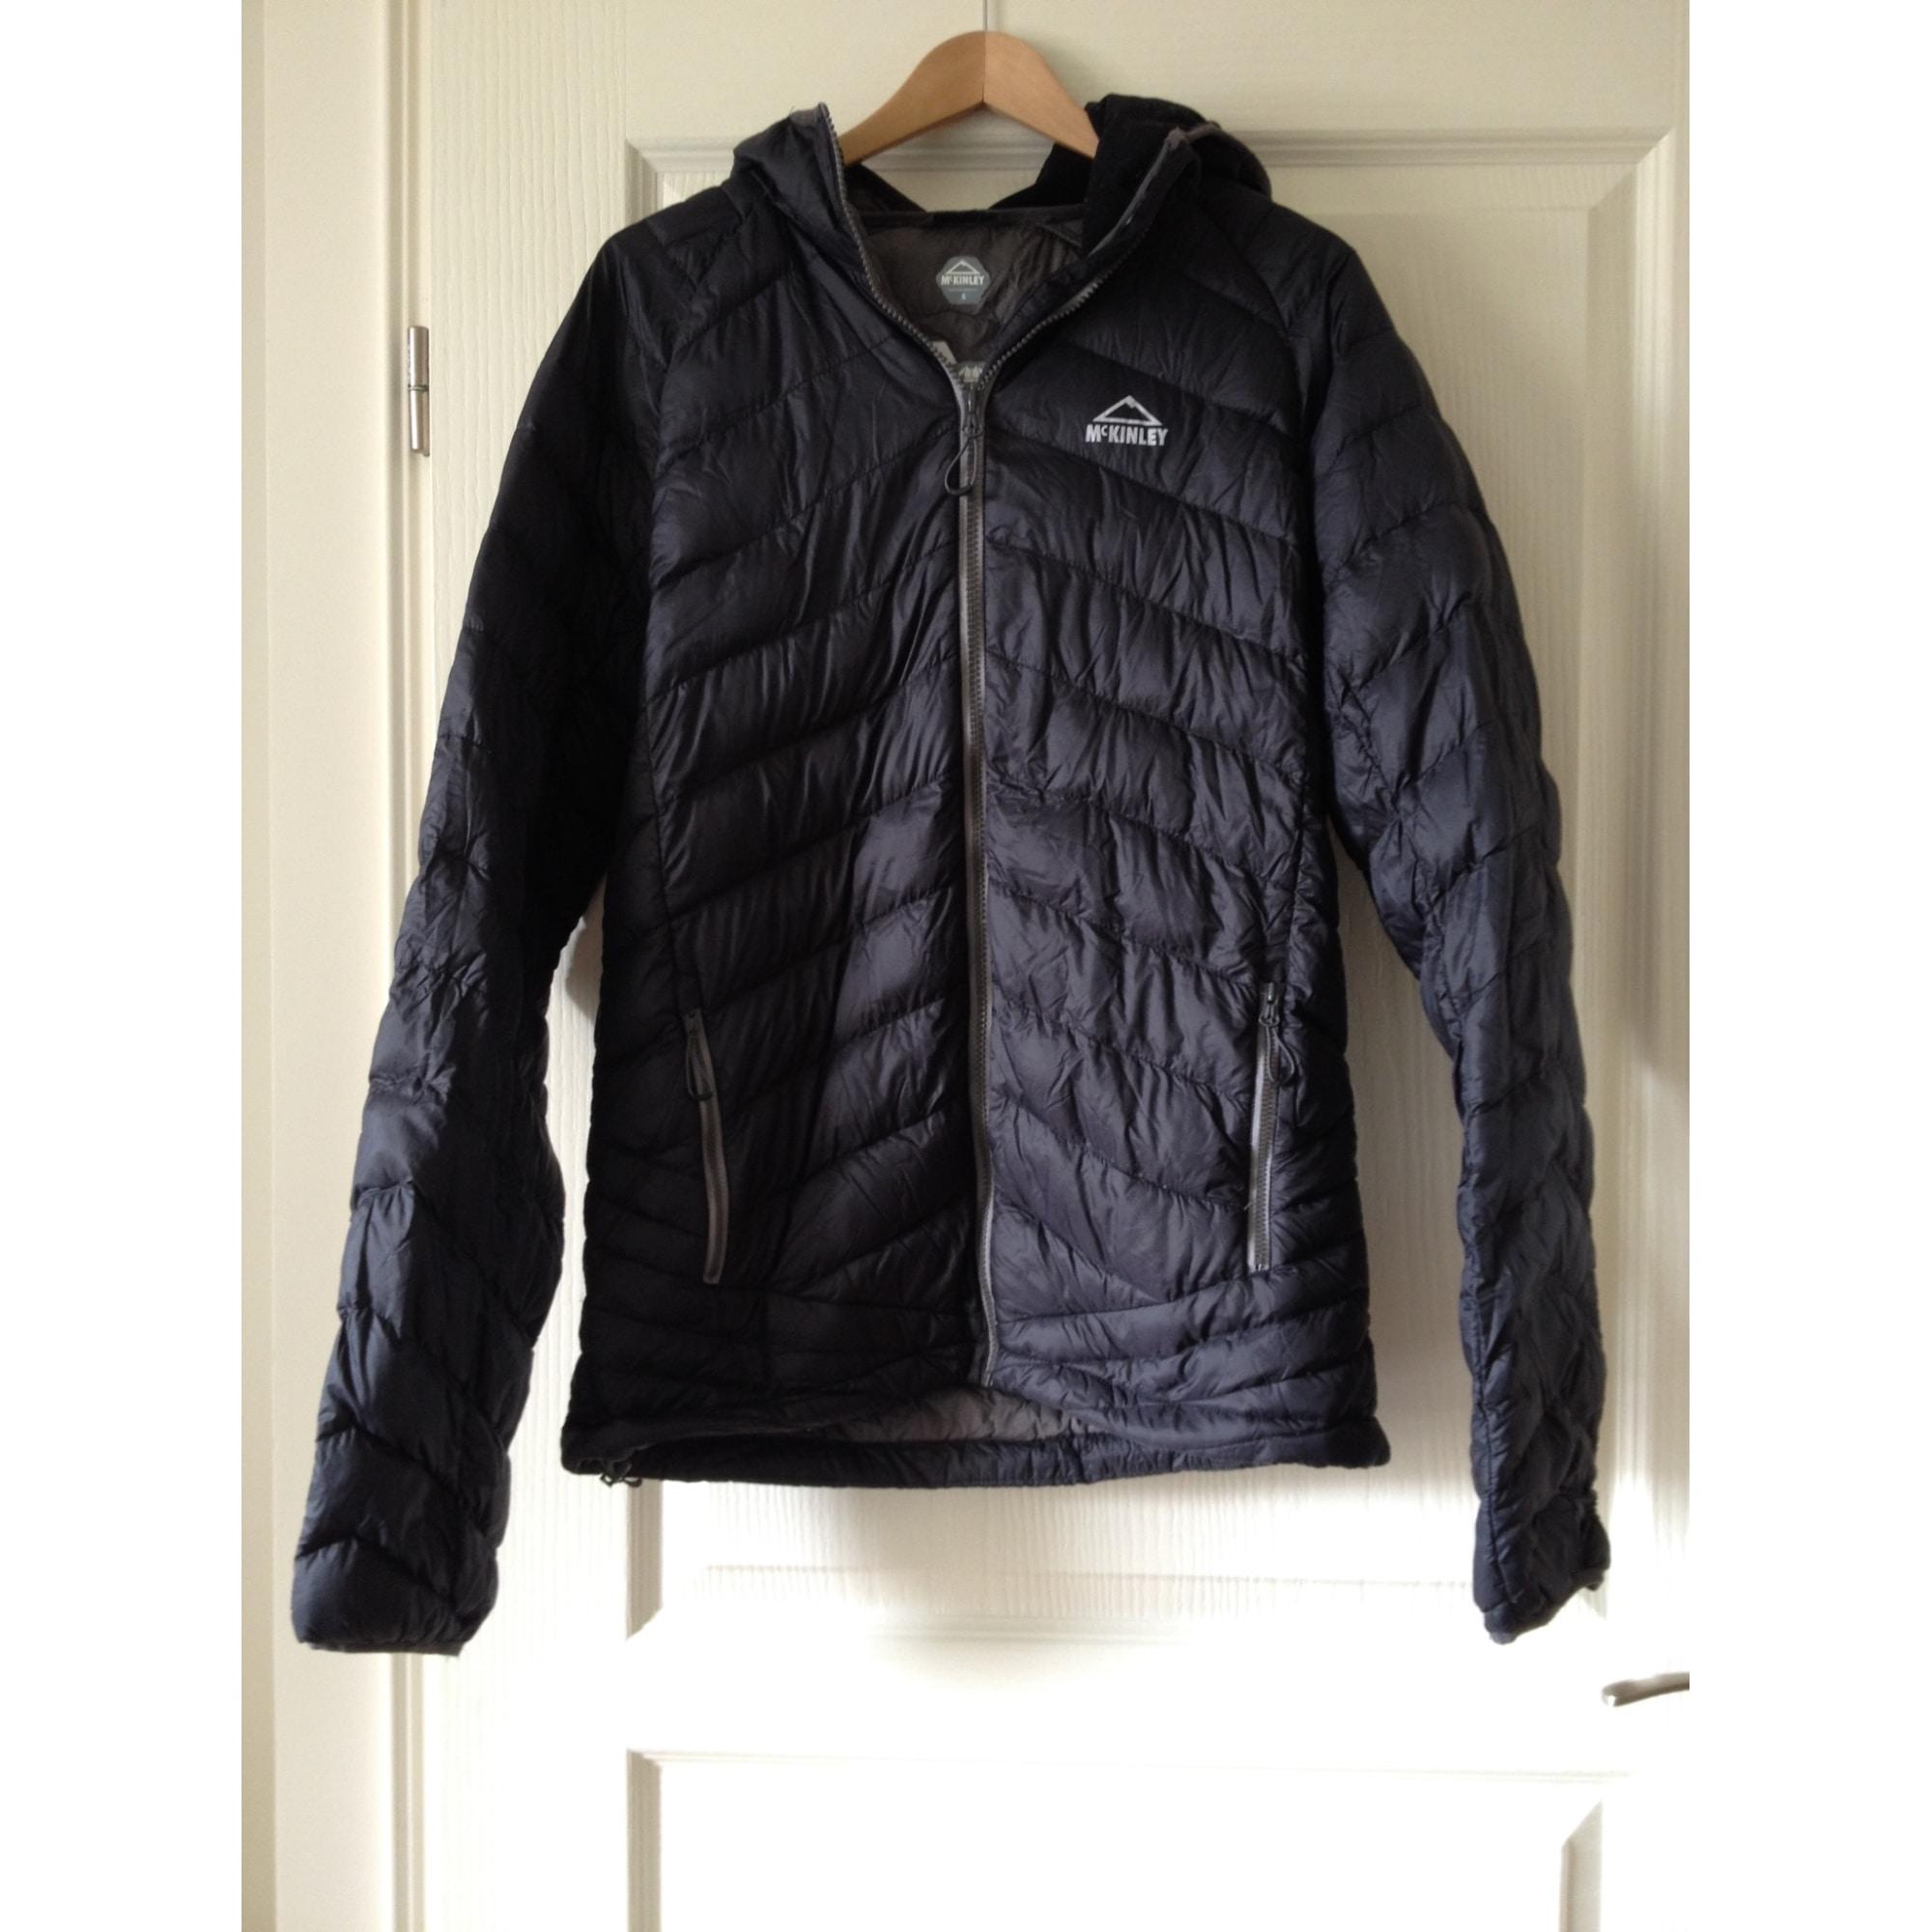 Doudoune MC KINLEY 46 (S) gris vendu par Carole29211913 - 6438195 82231fa1eb2